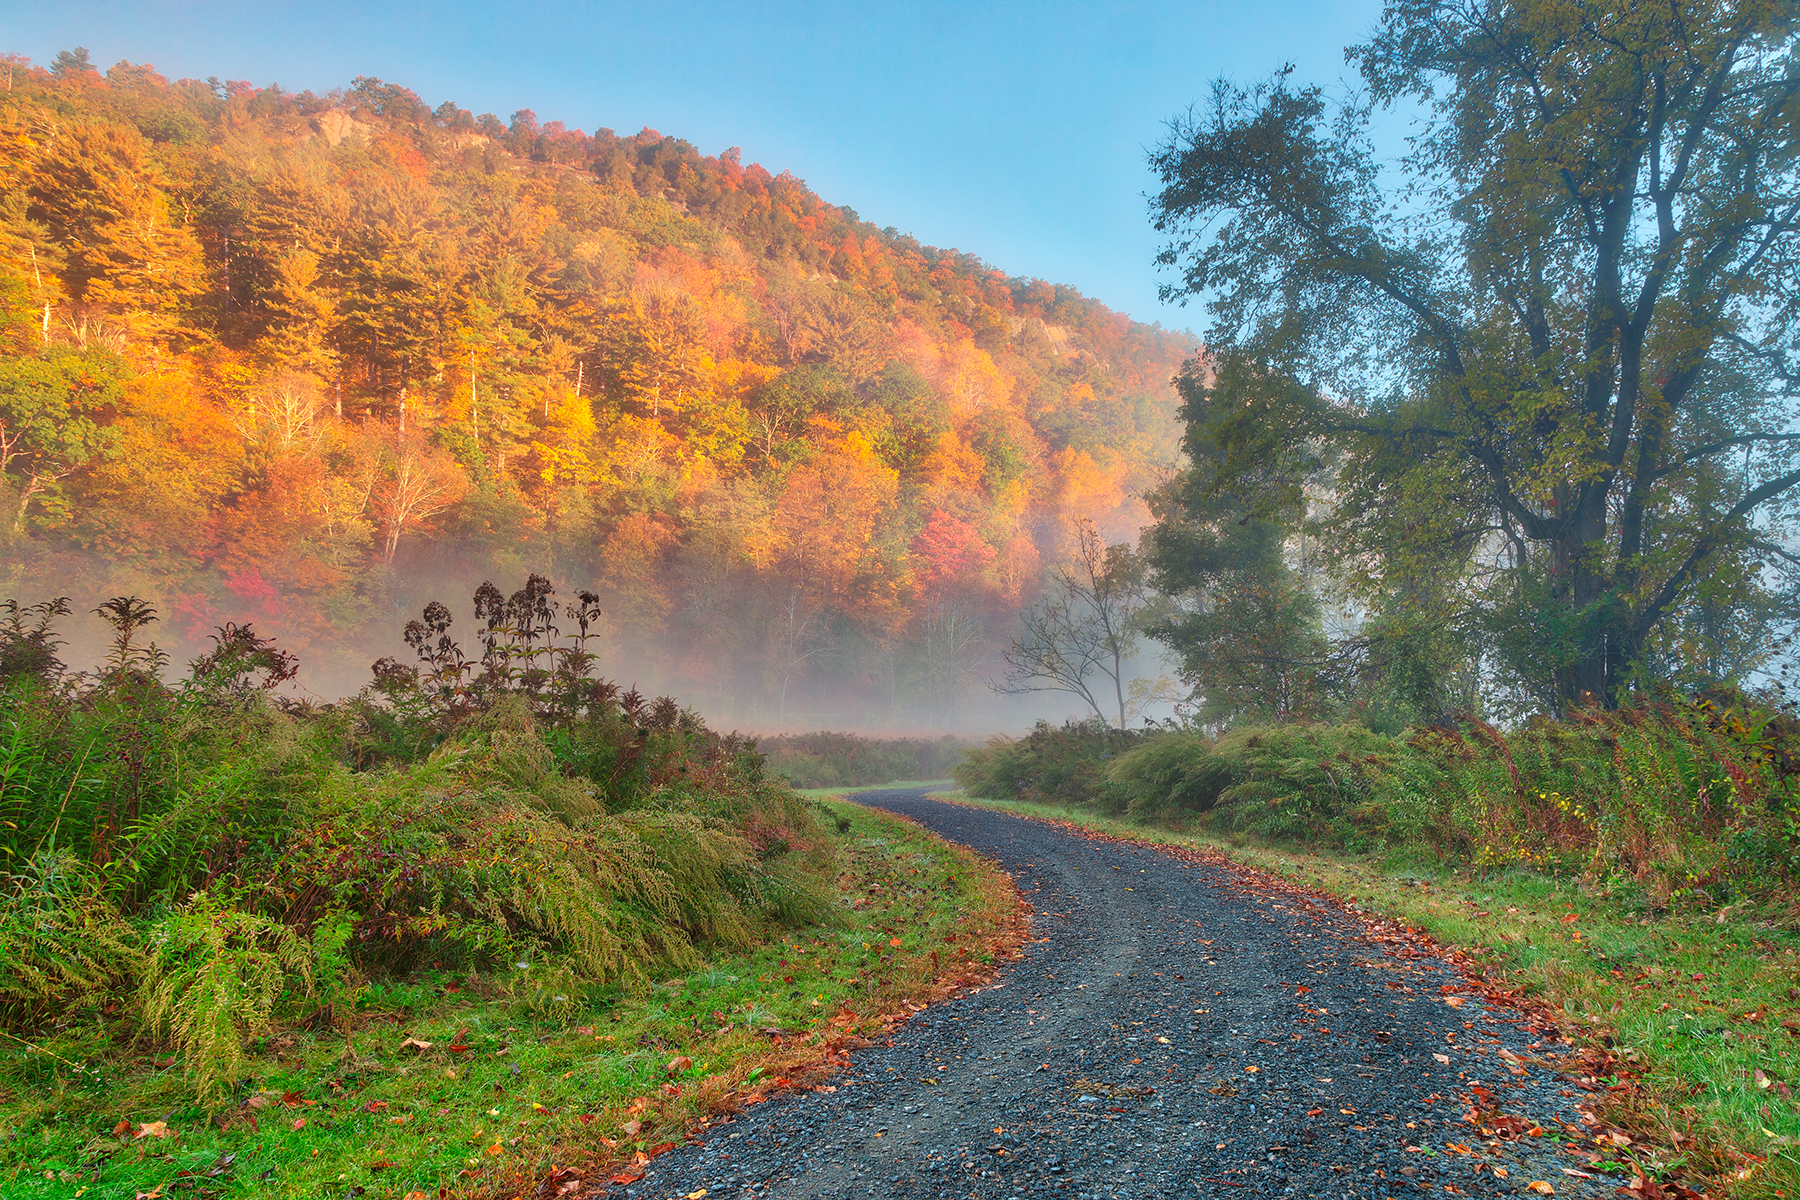 Misty autumn mcdade trail - hdr photo